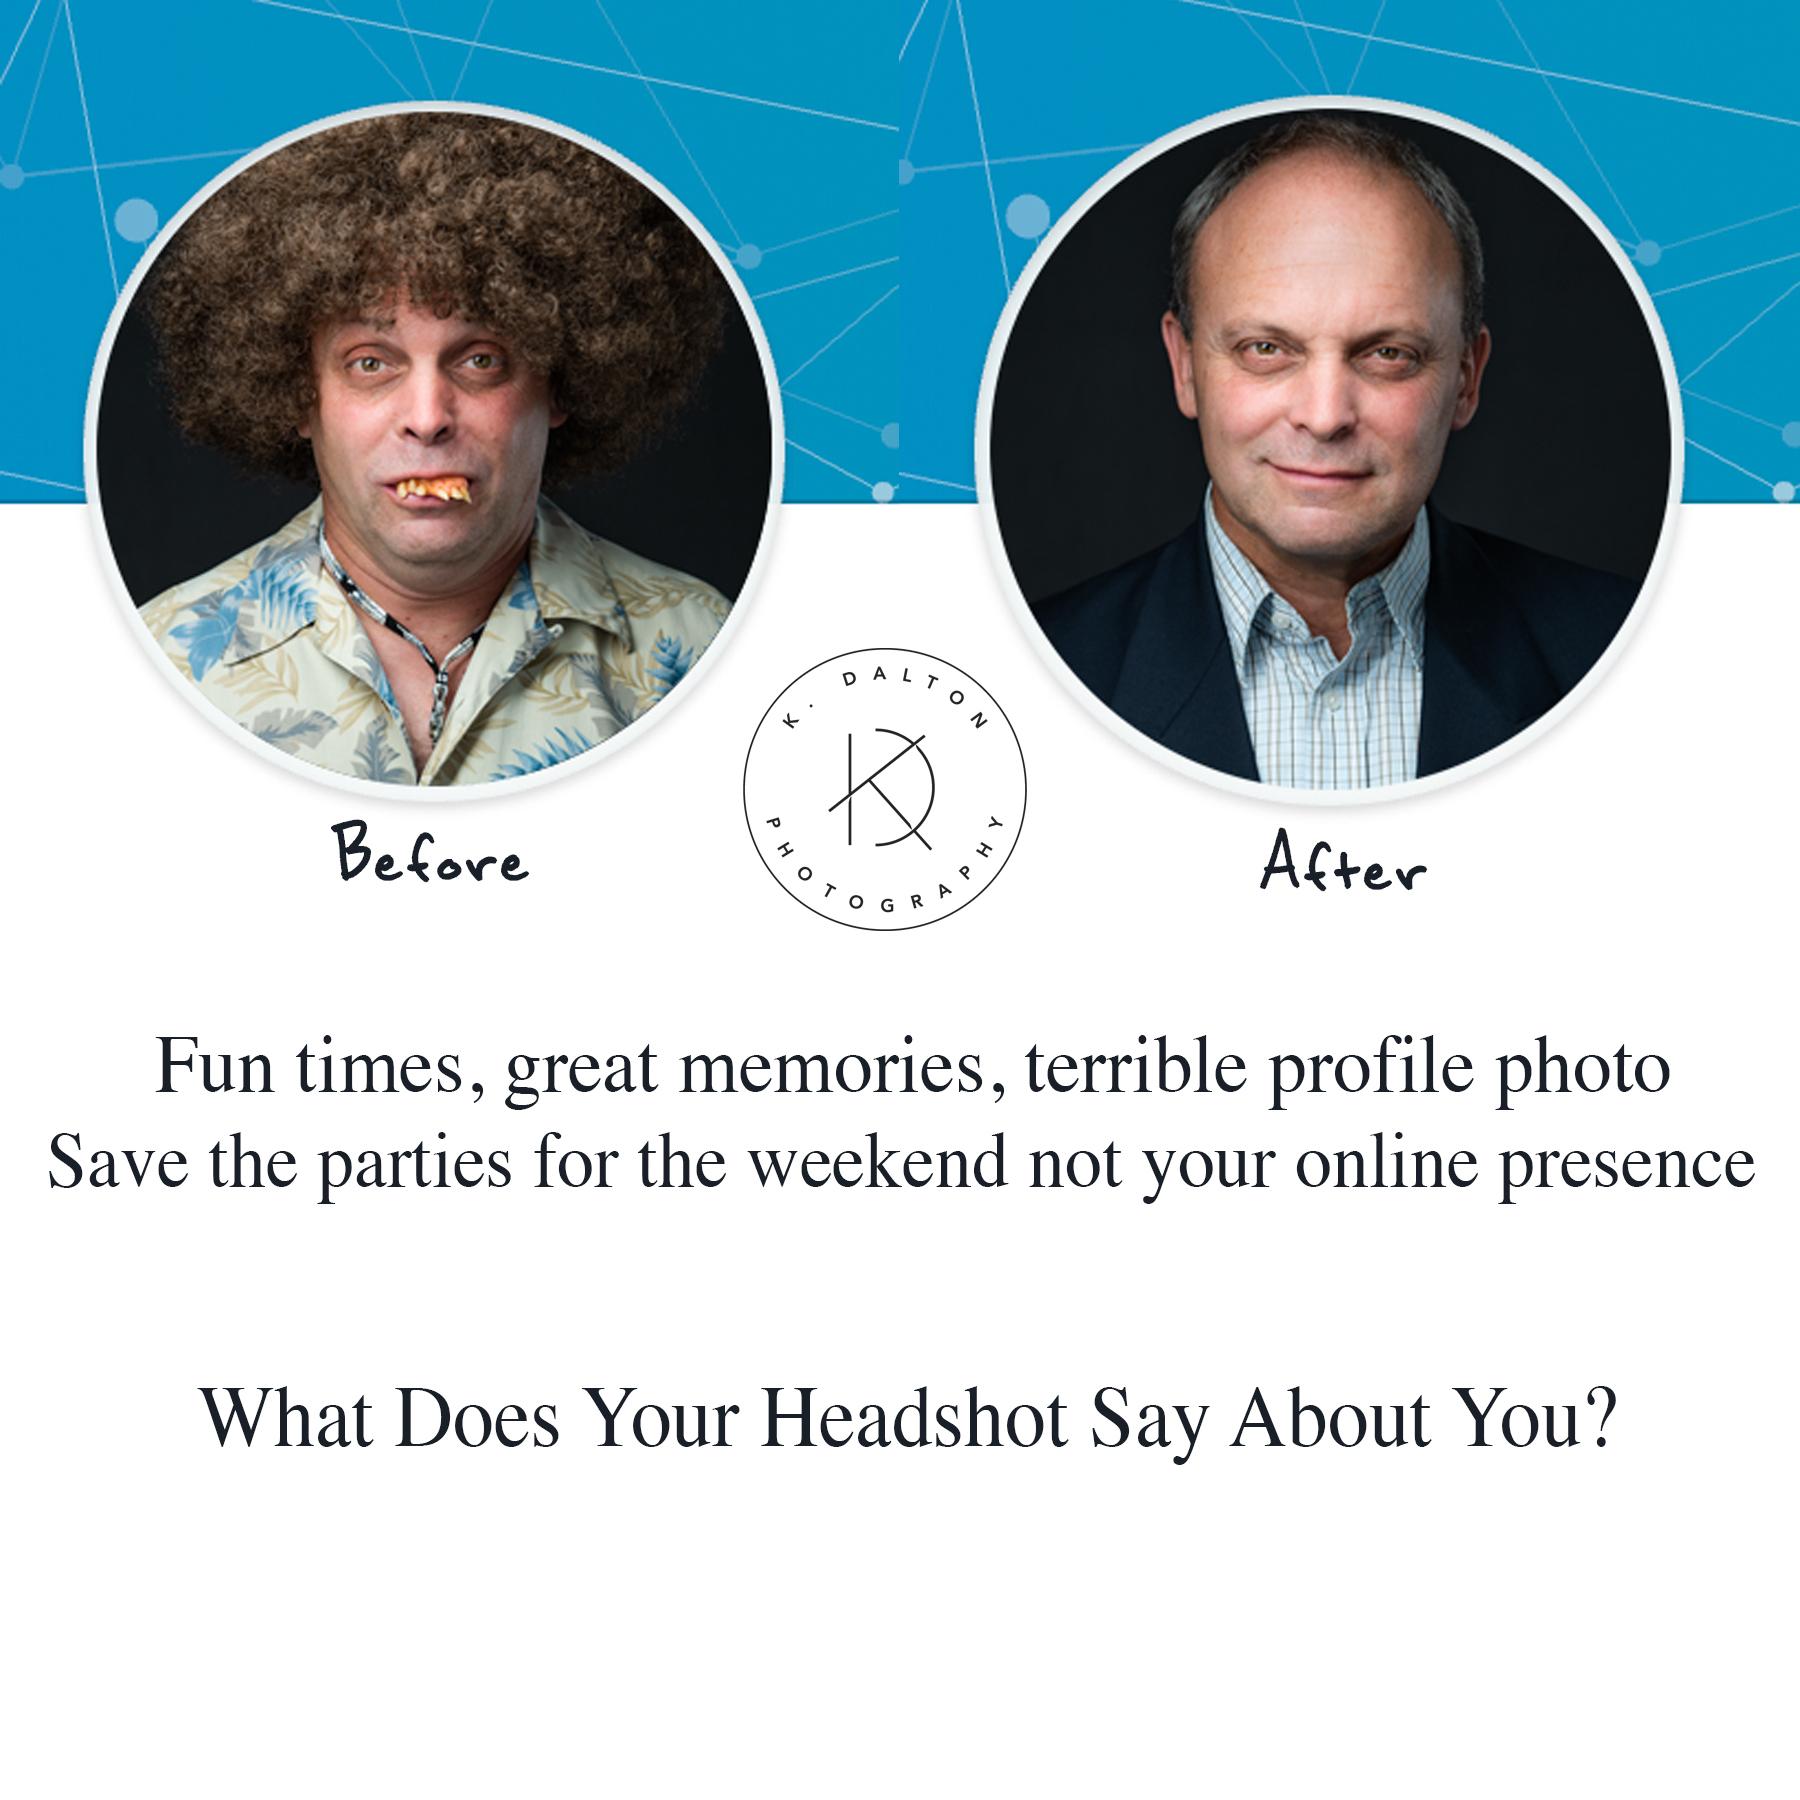 Business Headshot LinkedIn